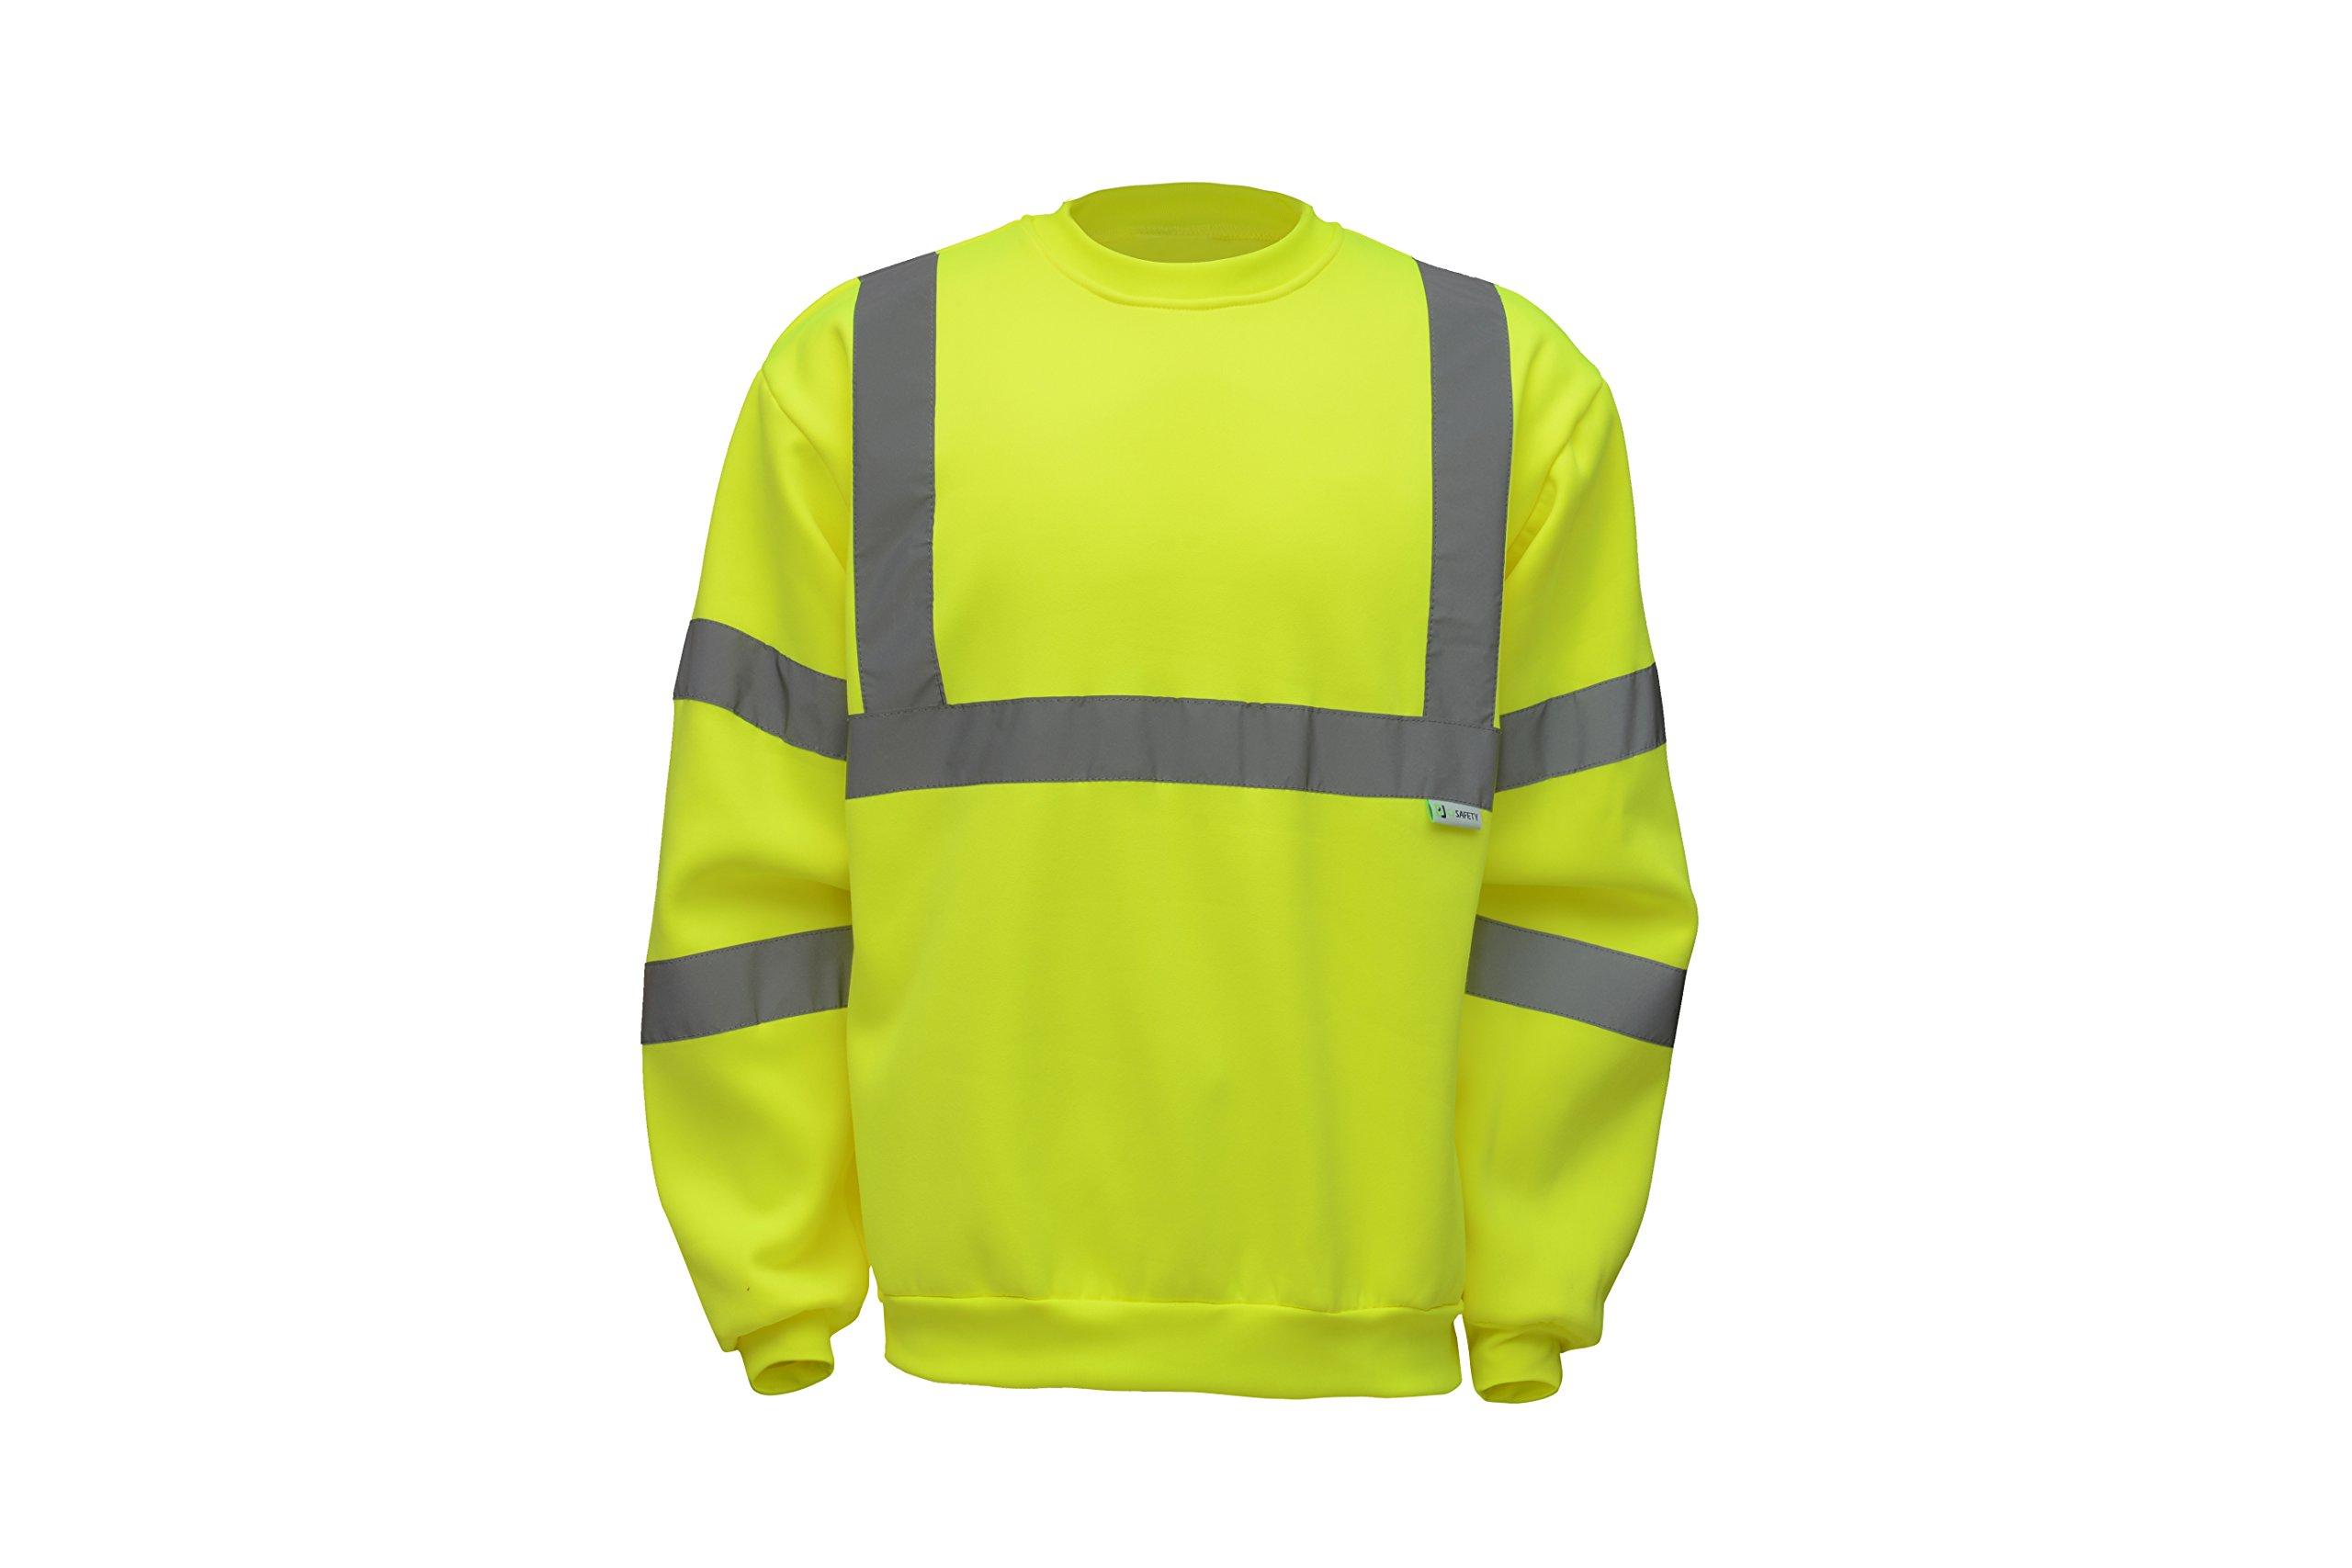 CJ Safety CJHVSS3002 ANSI Class 3 High Visibility Crew Neck Fleece Safety Sweatshirt (Extra Large)